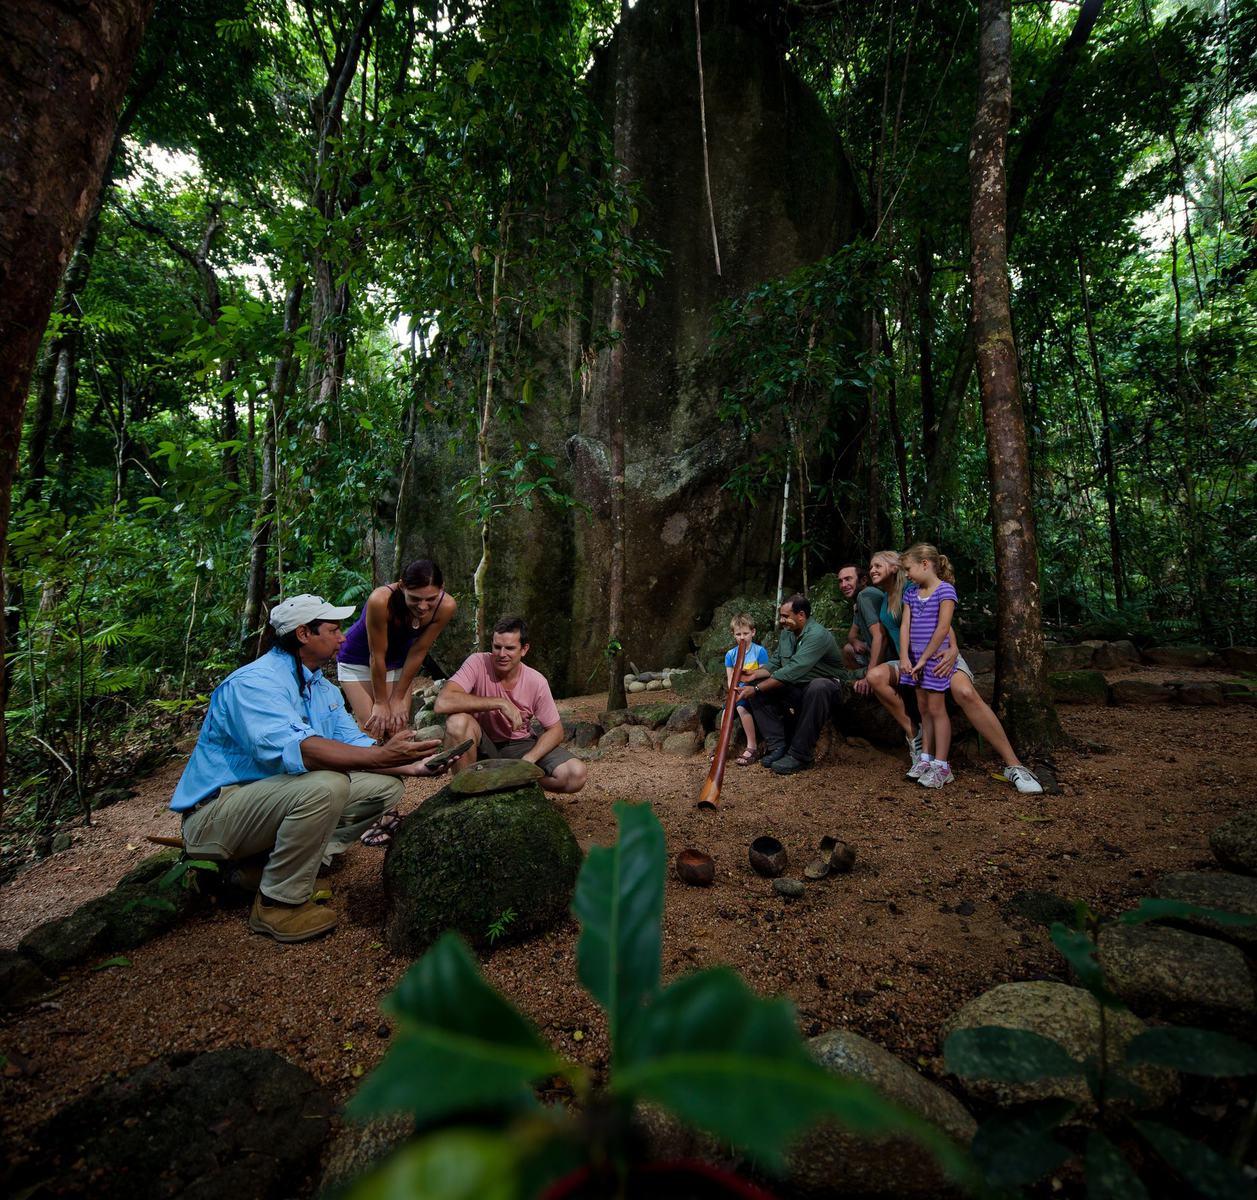 mossman gorge tours from mossman gorge centre on dreamtime walk indigenous culture Aboriginal tours of the Daintree rainforest